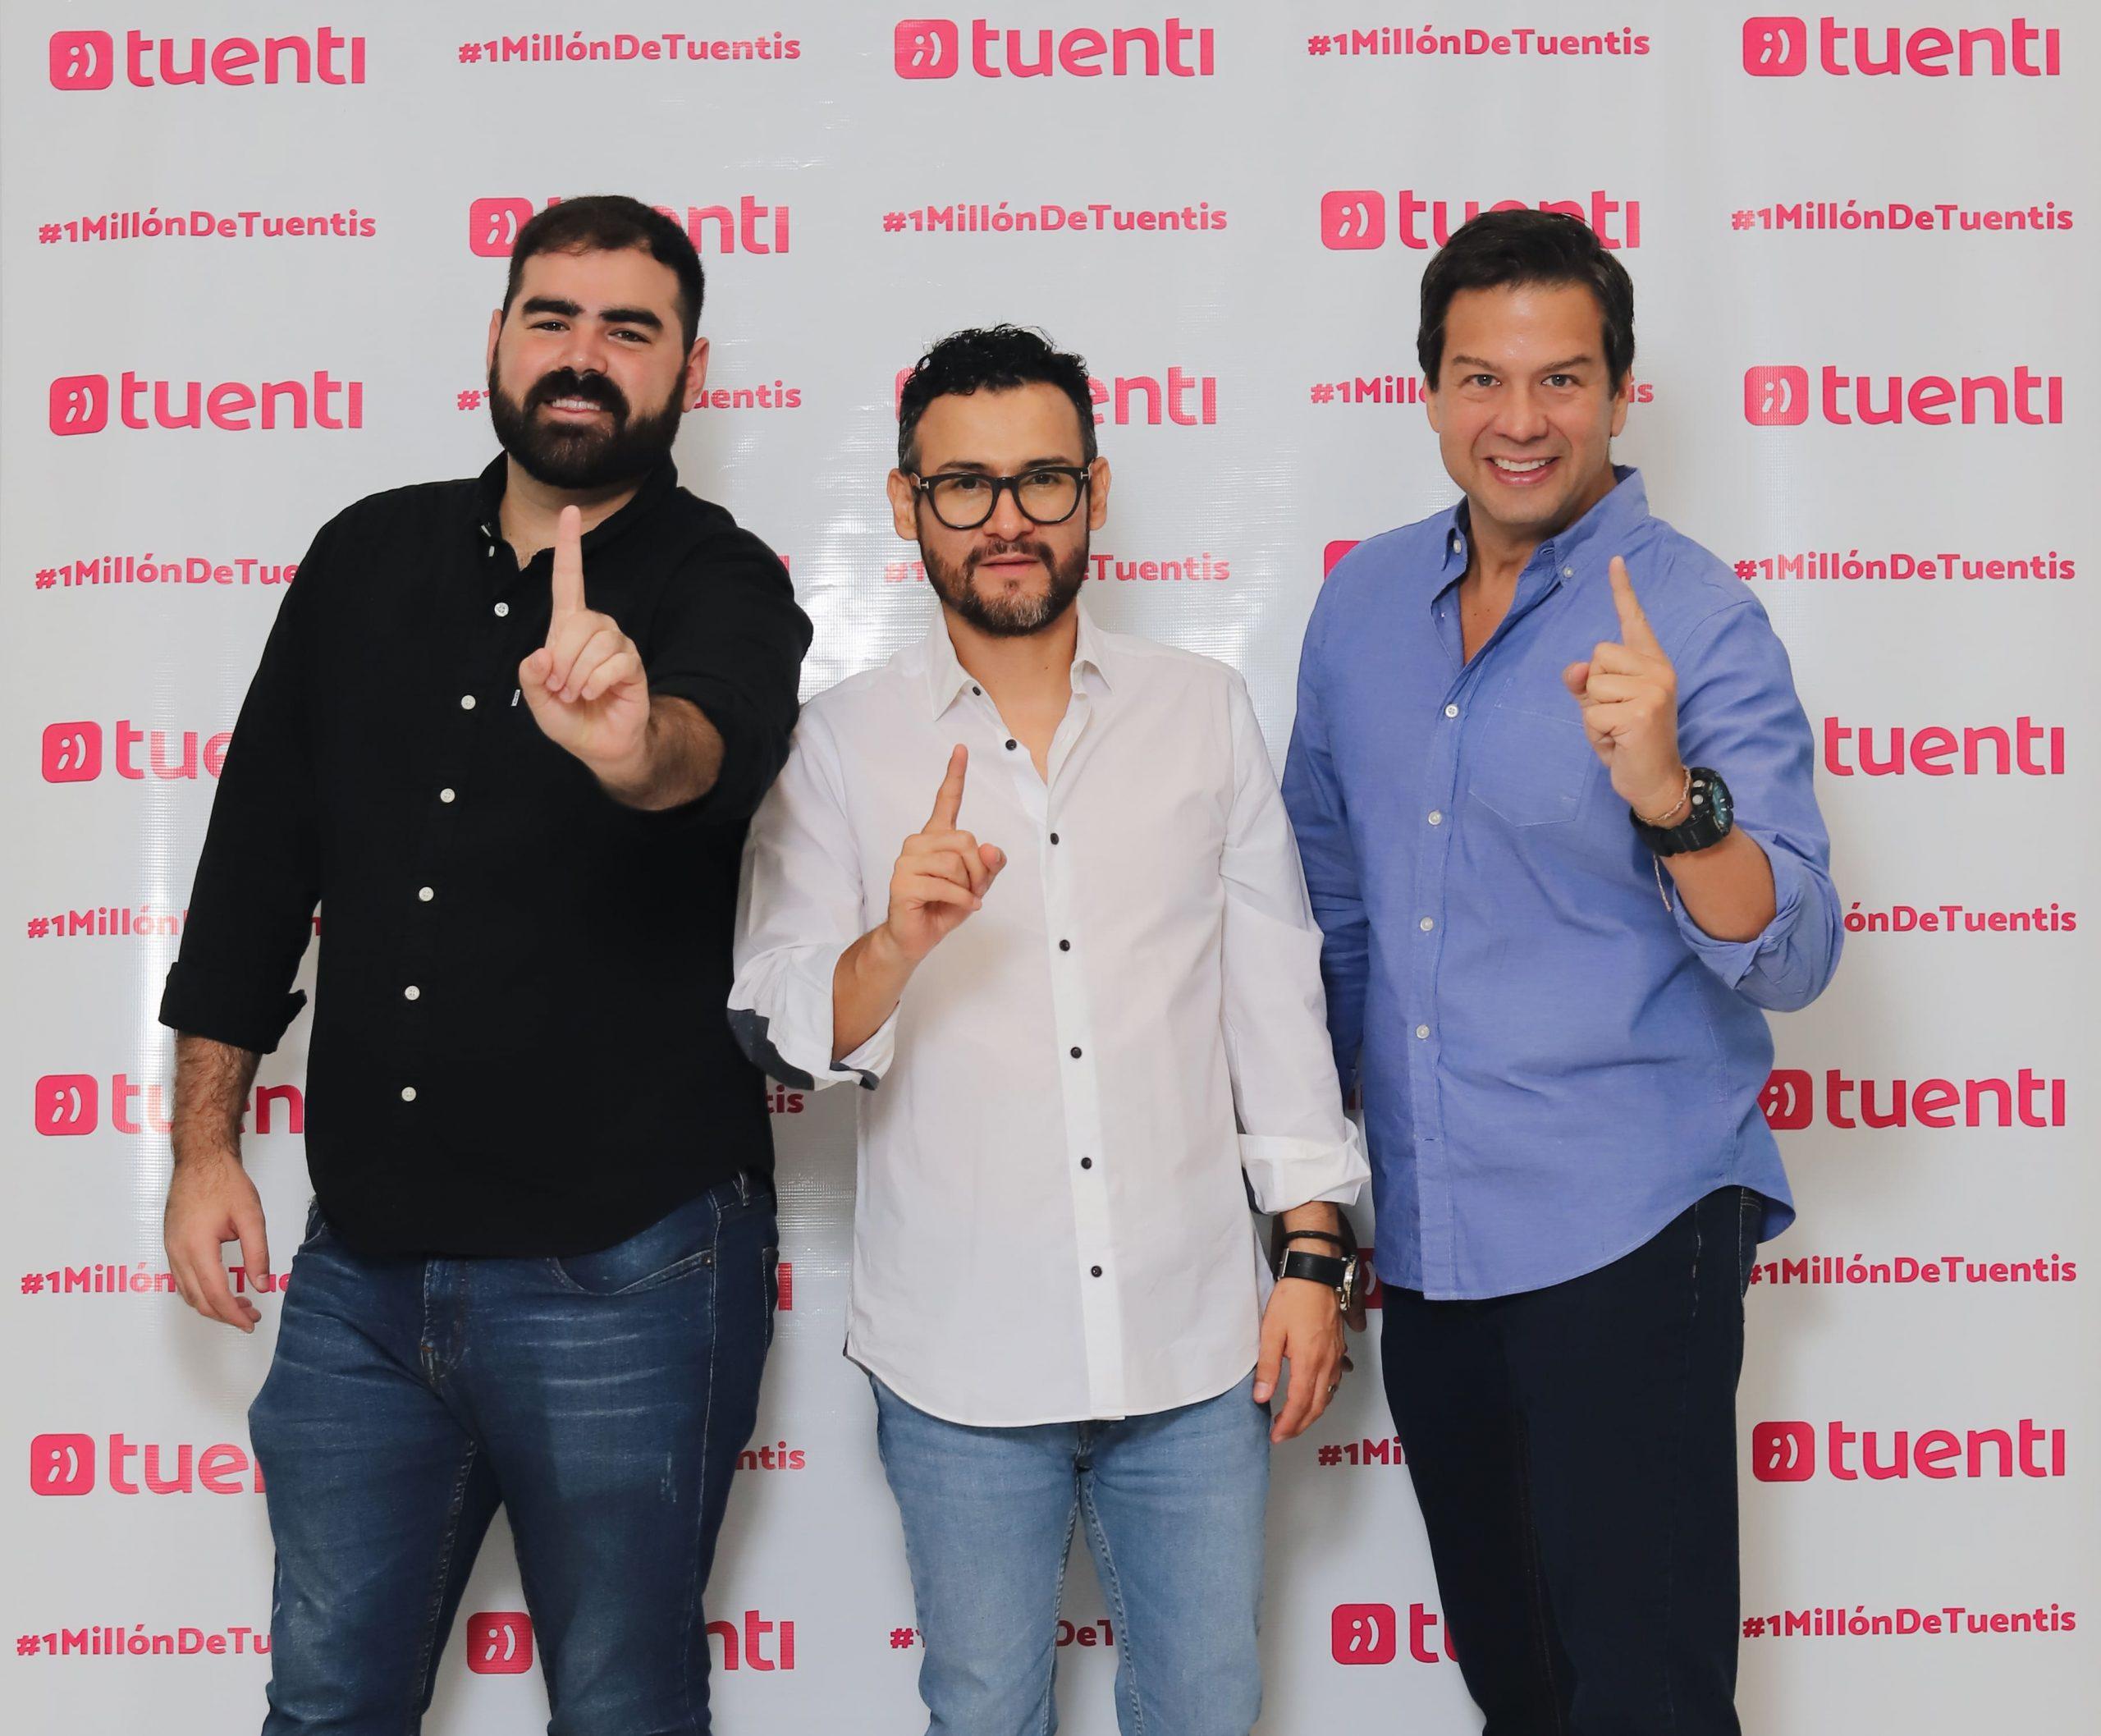 TUENTI FESTEJA 1 MILLÓN DE CLIENTES